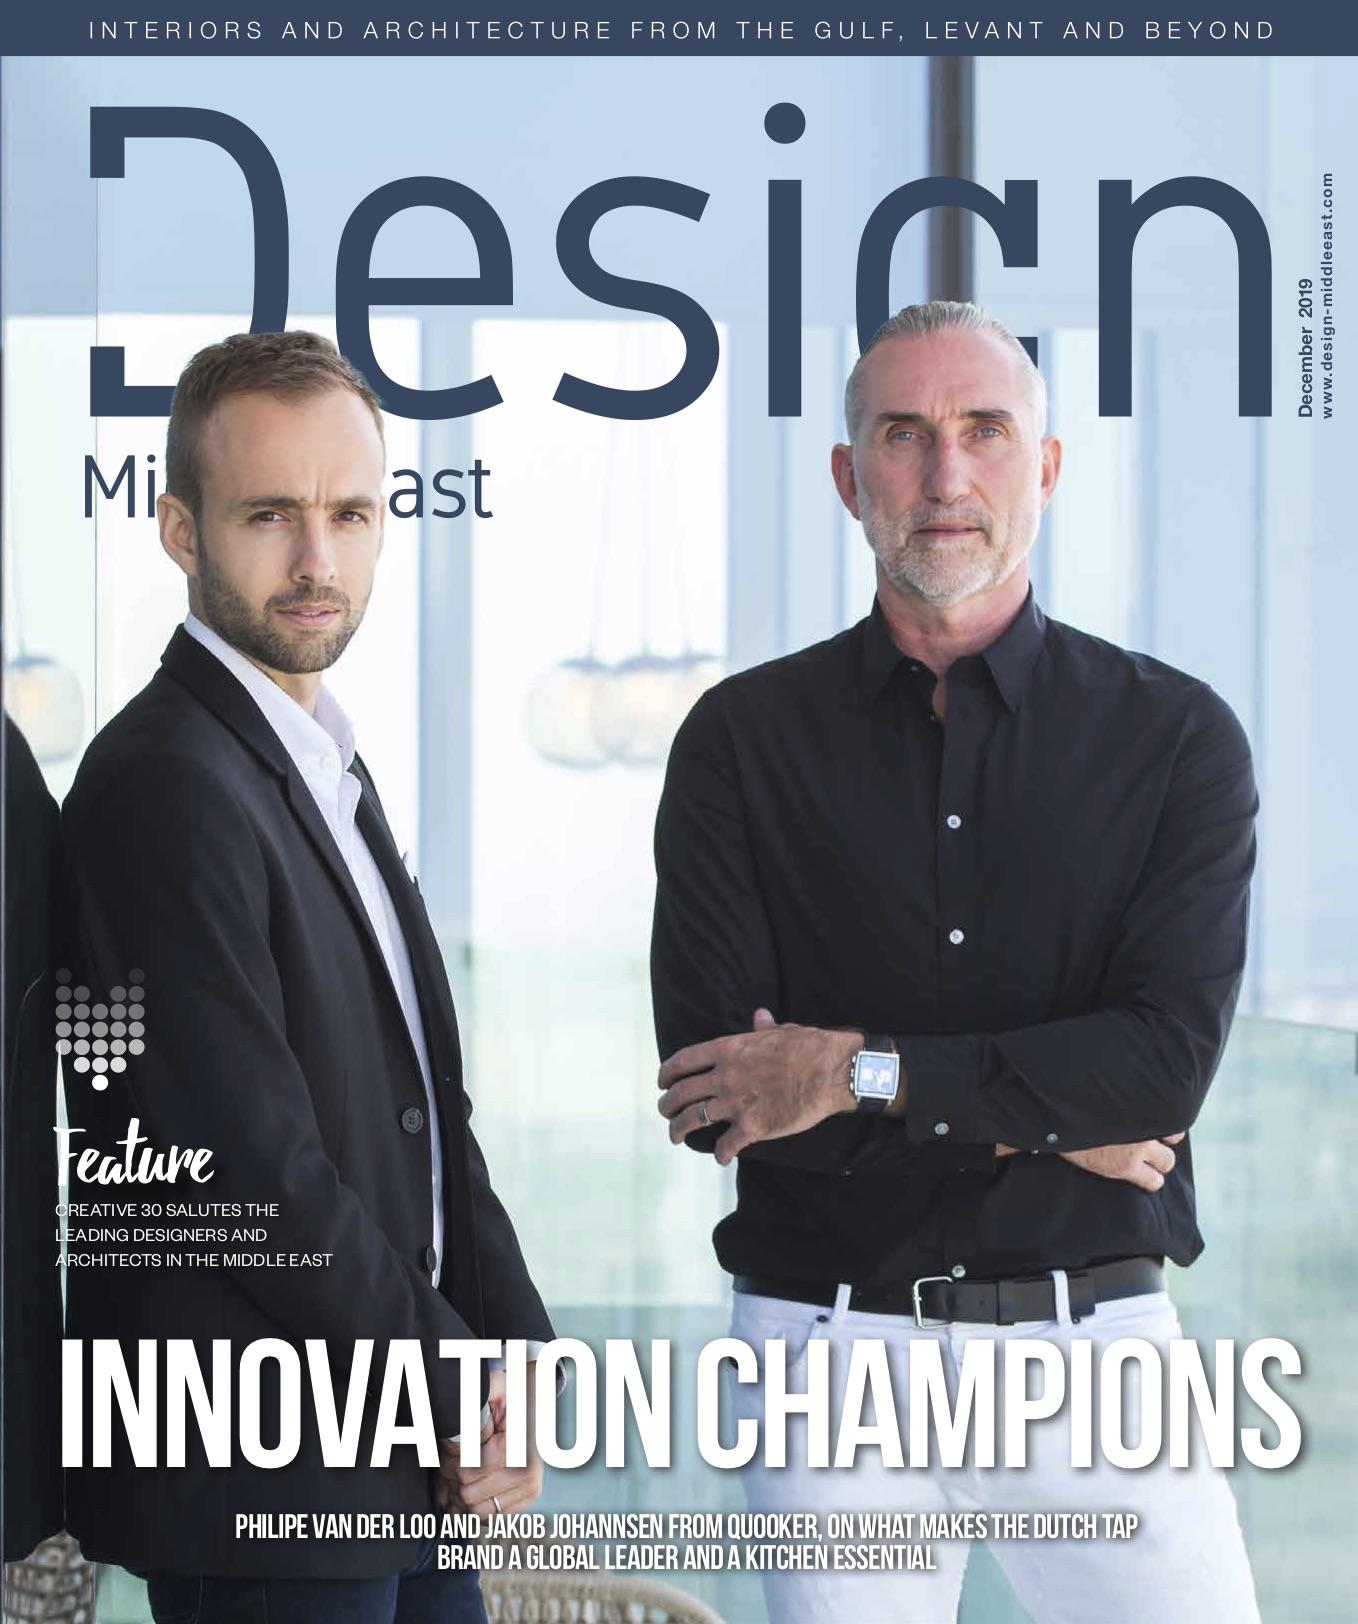 https://www.cbnme.com/magazines/design-middle-east-december-2019/